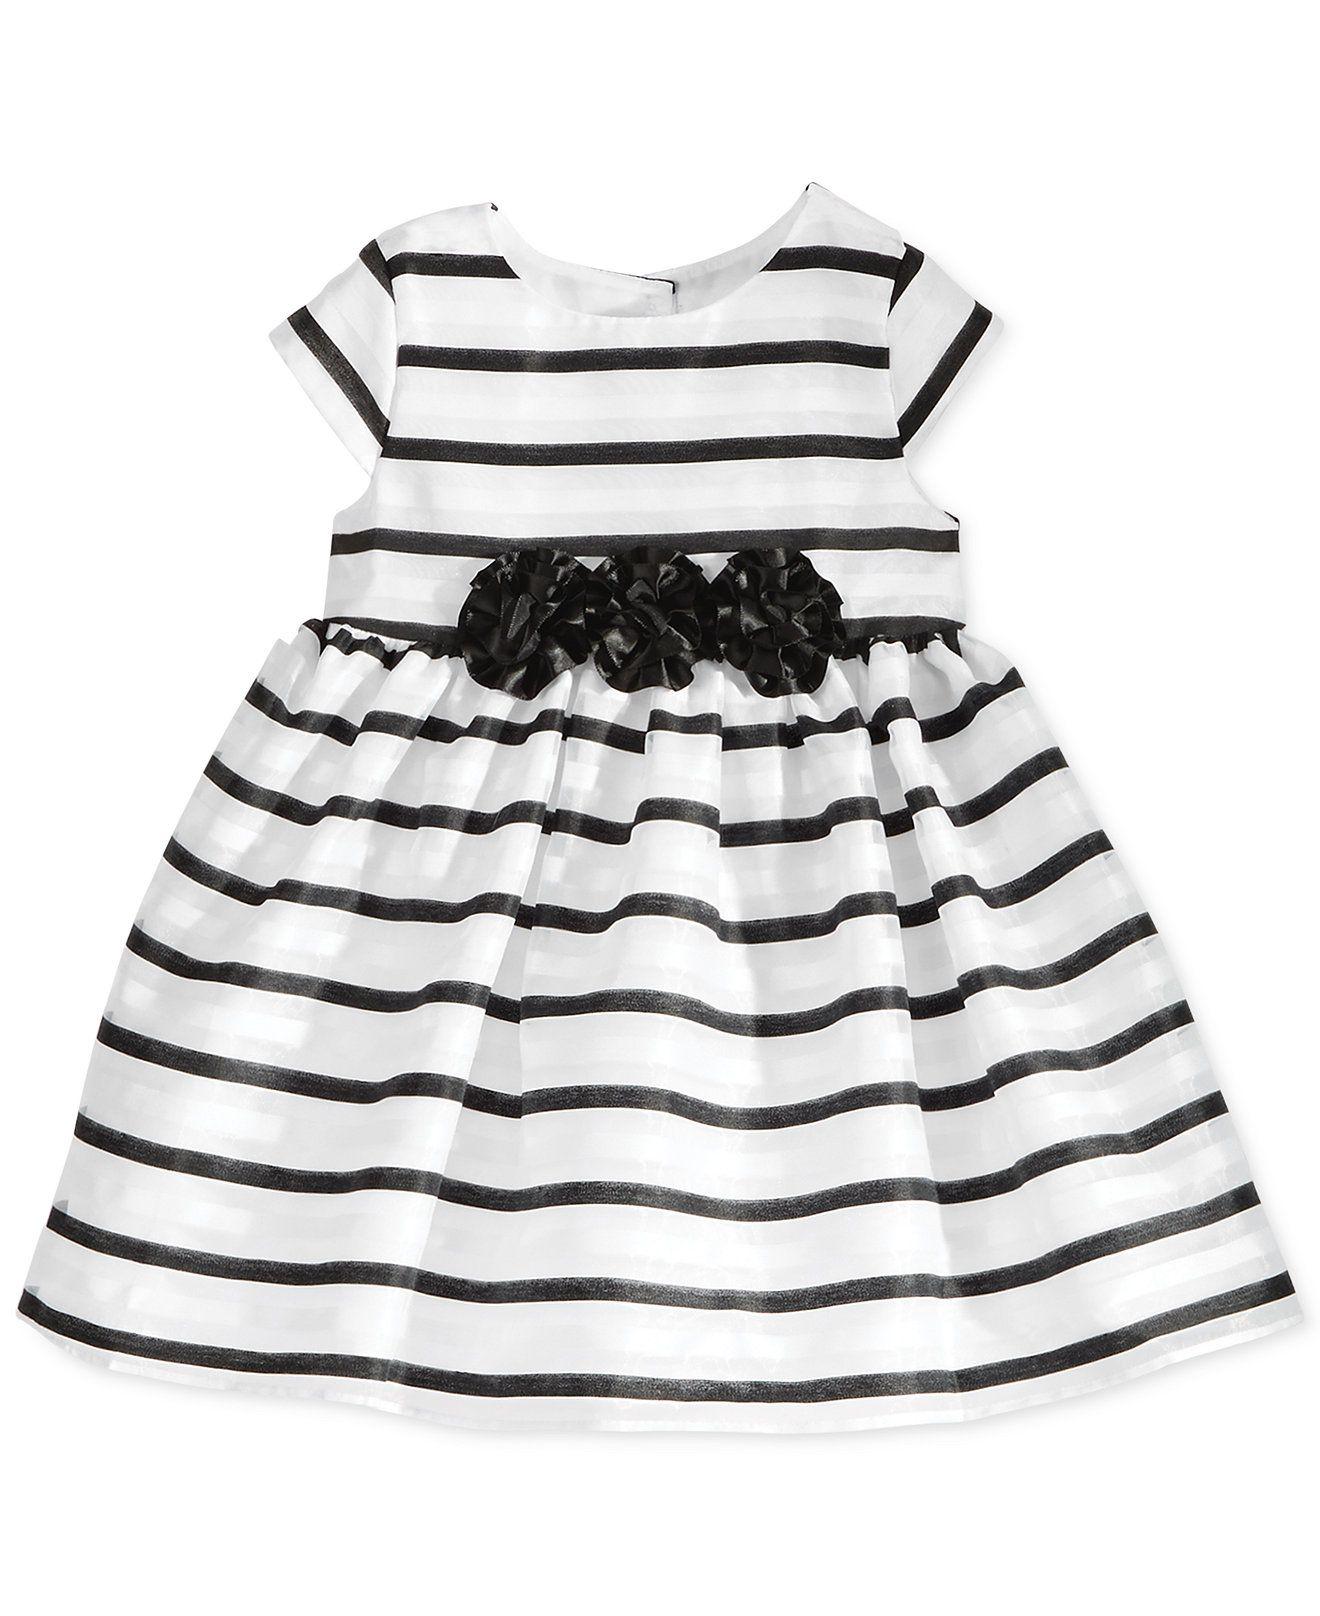 Marmellata Baby Girls Black & White Strip Dress Kids & Baby